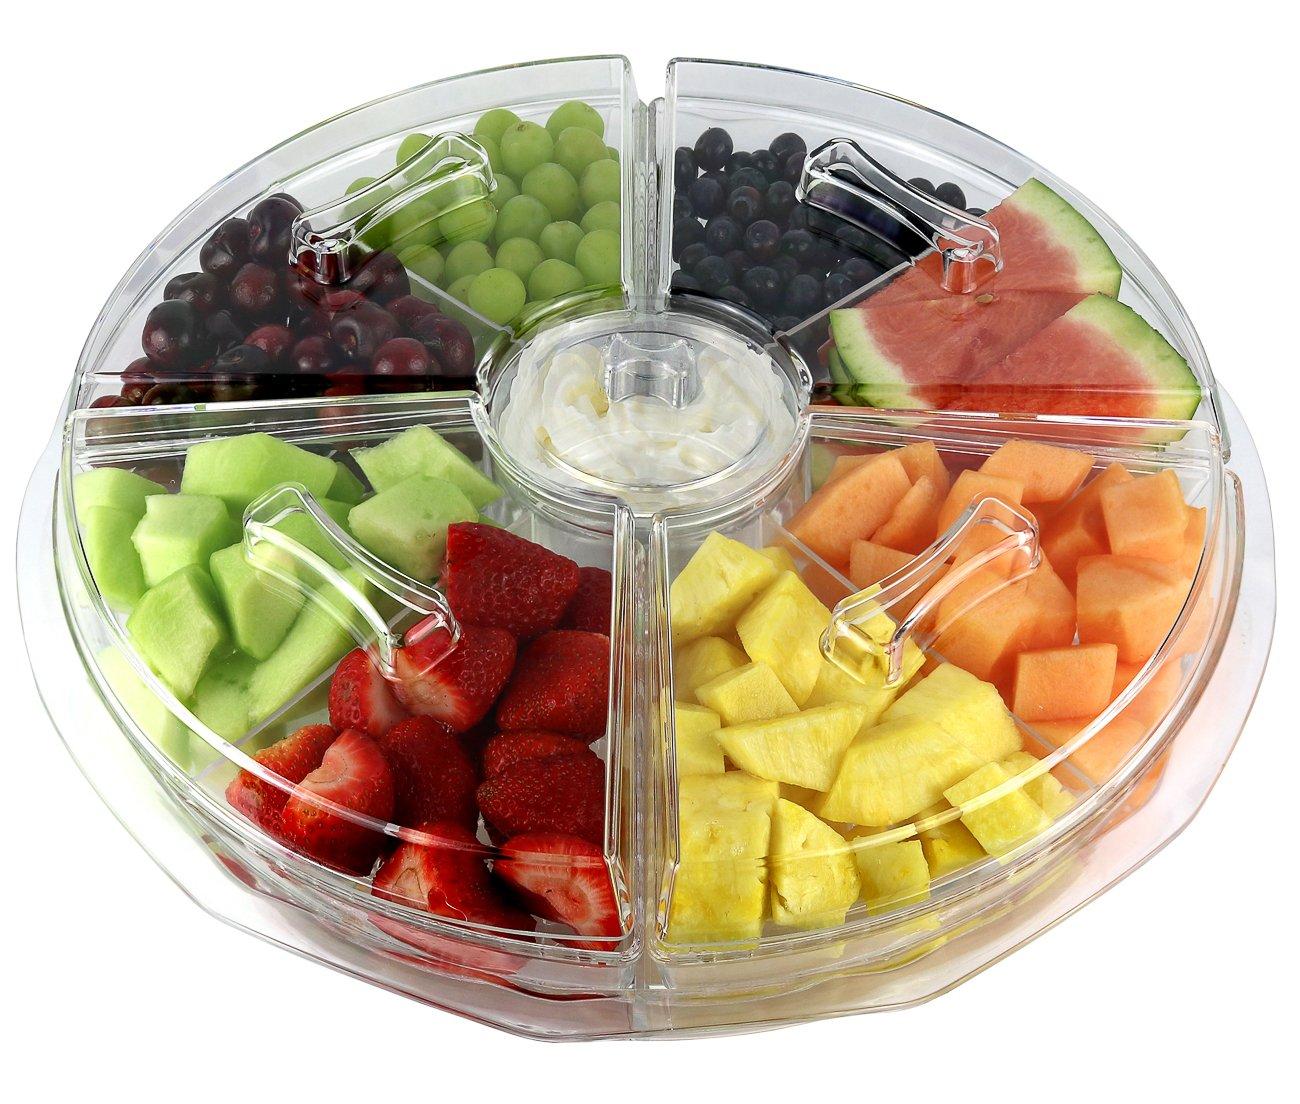 Estilo 8 Section Appetizer Platter On-Ice with Lids, Clear by Estilo (Image #1)